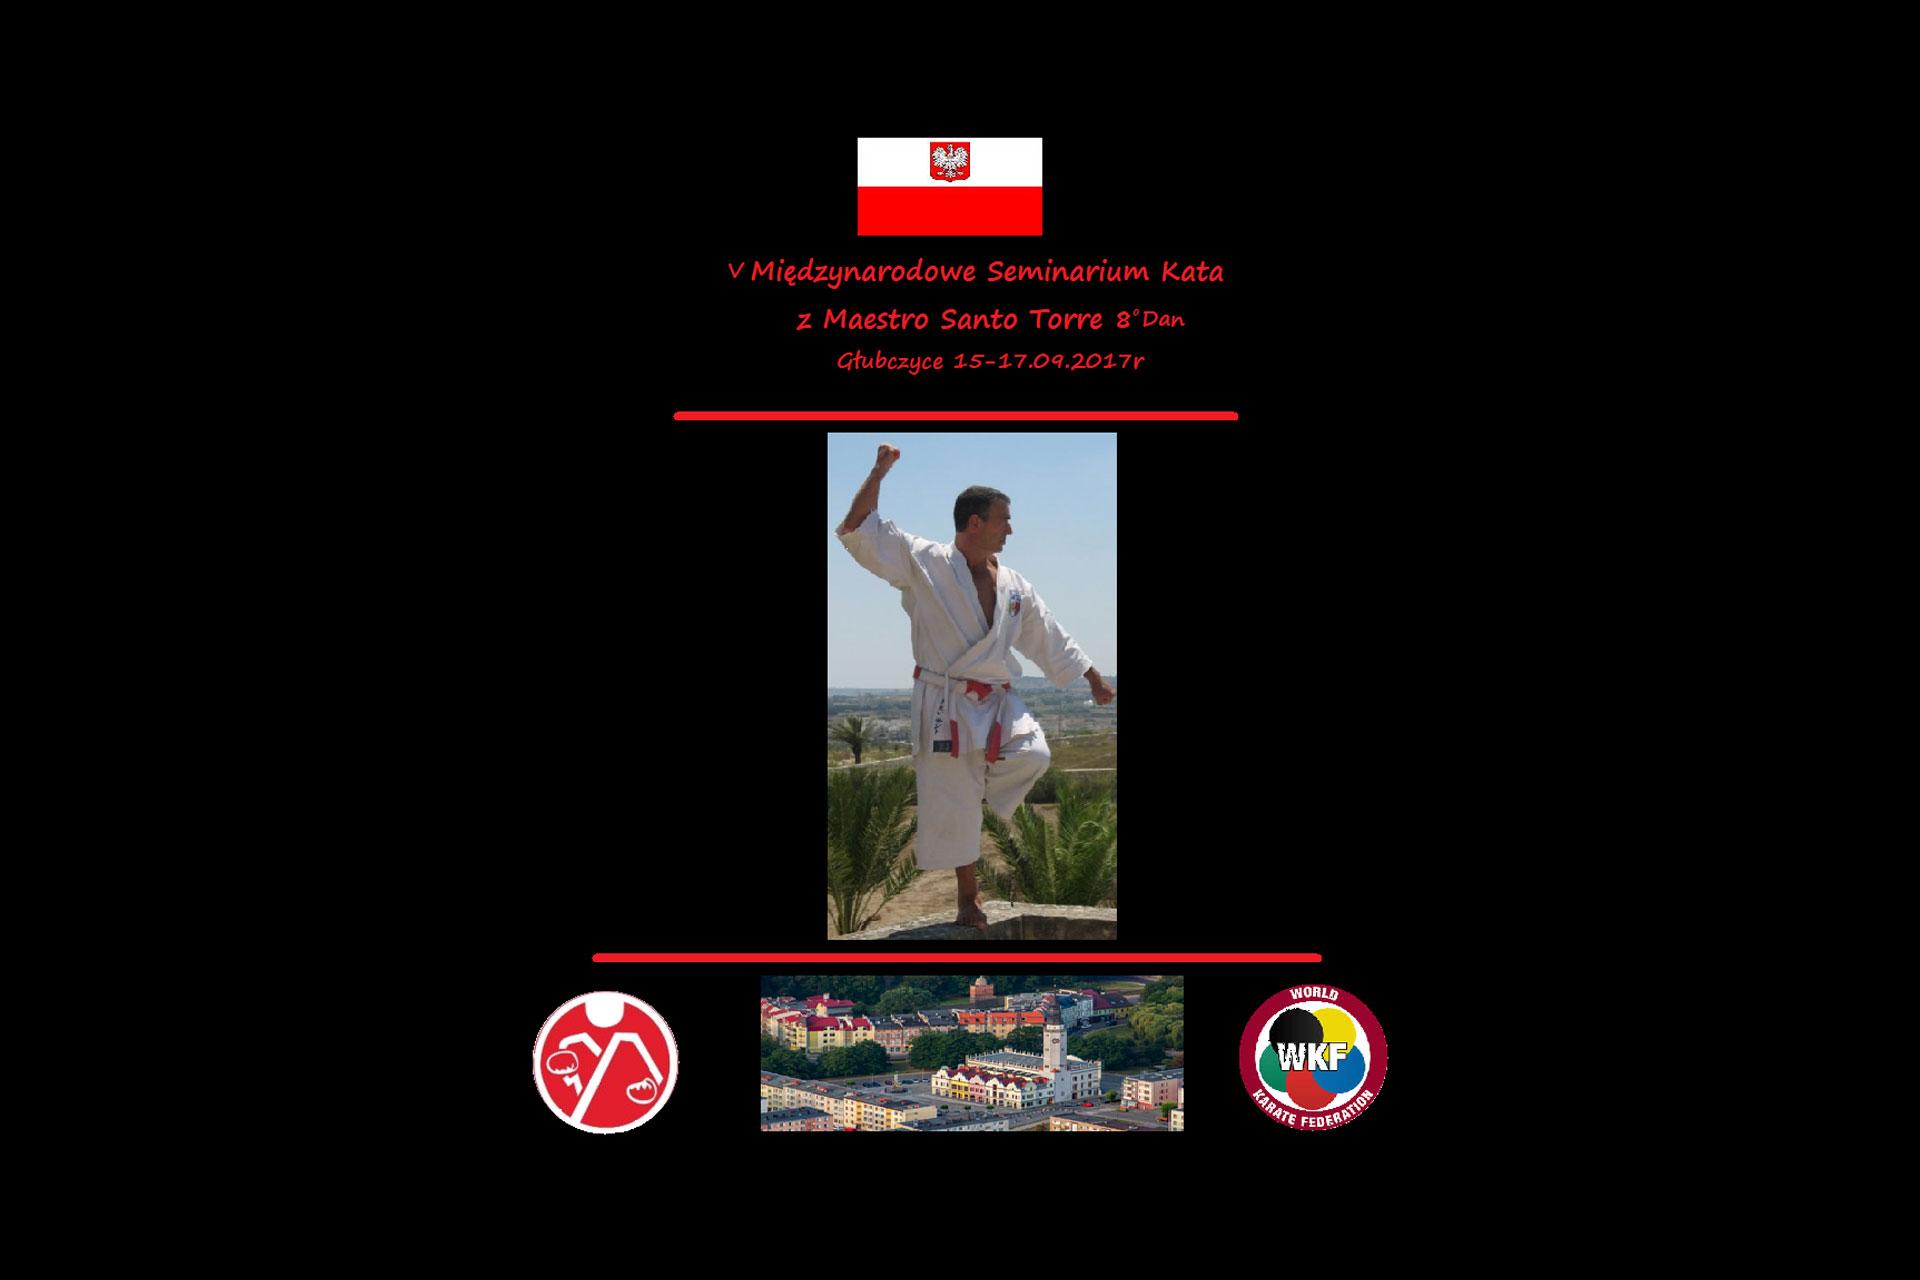 10-lecie klubu oraz seminarium z Santo Torre